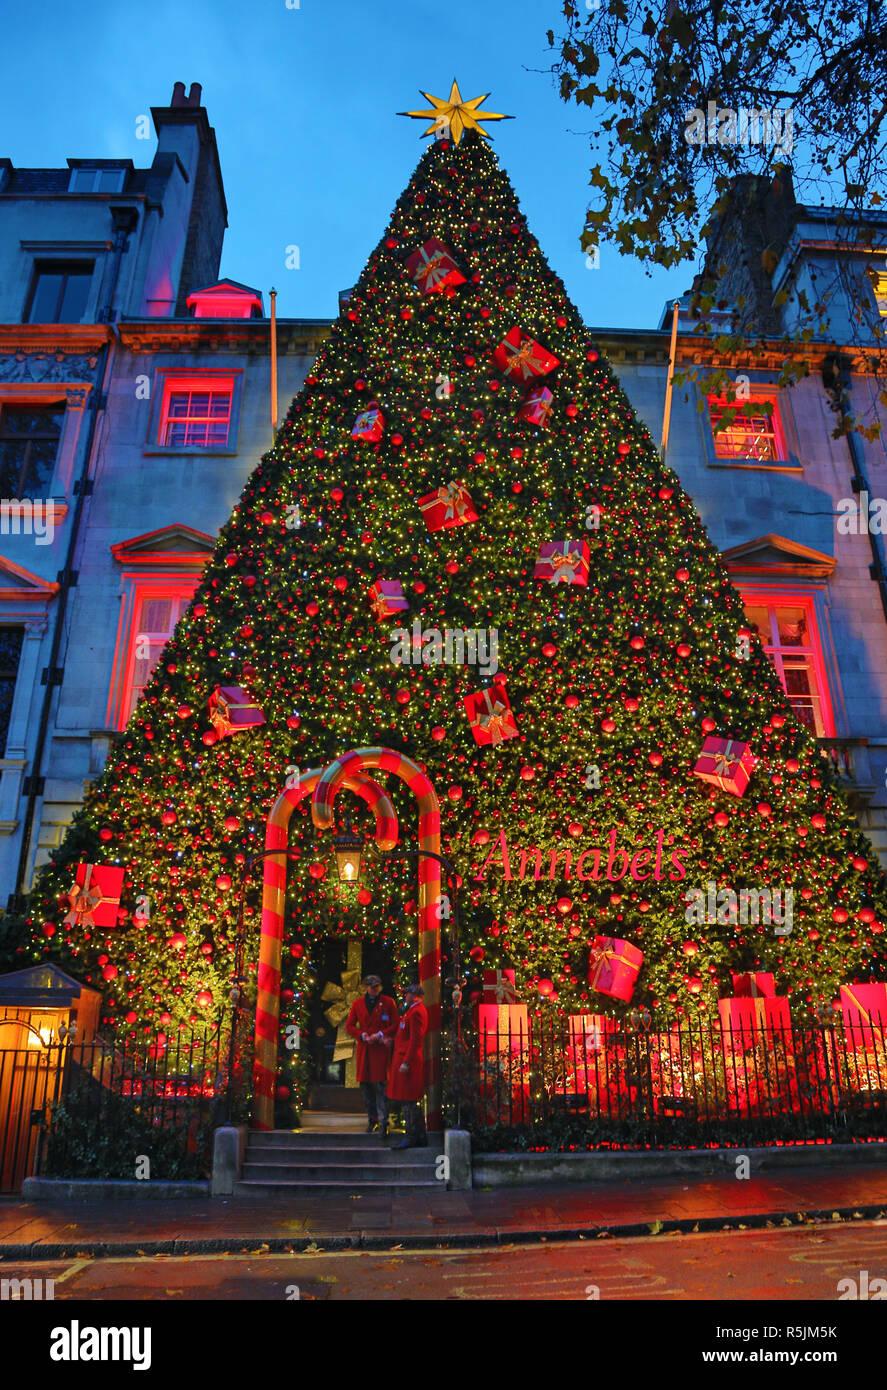 London Grossbritannien 1 Dezember 2018 Riesige Christbaumschmuck